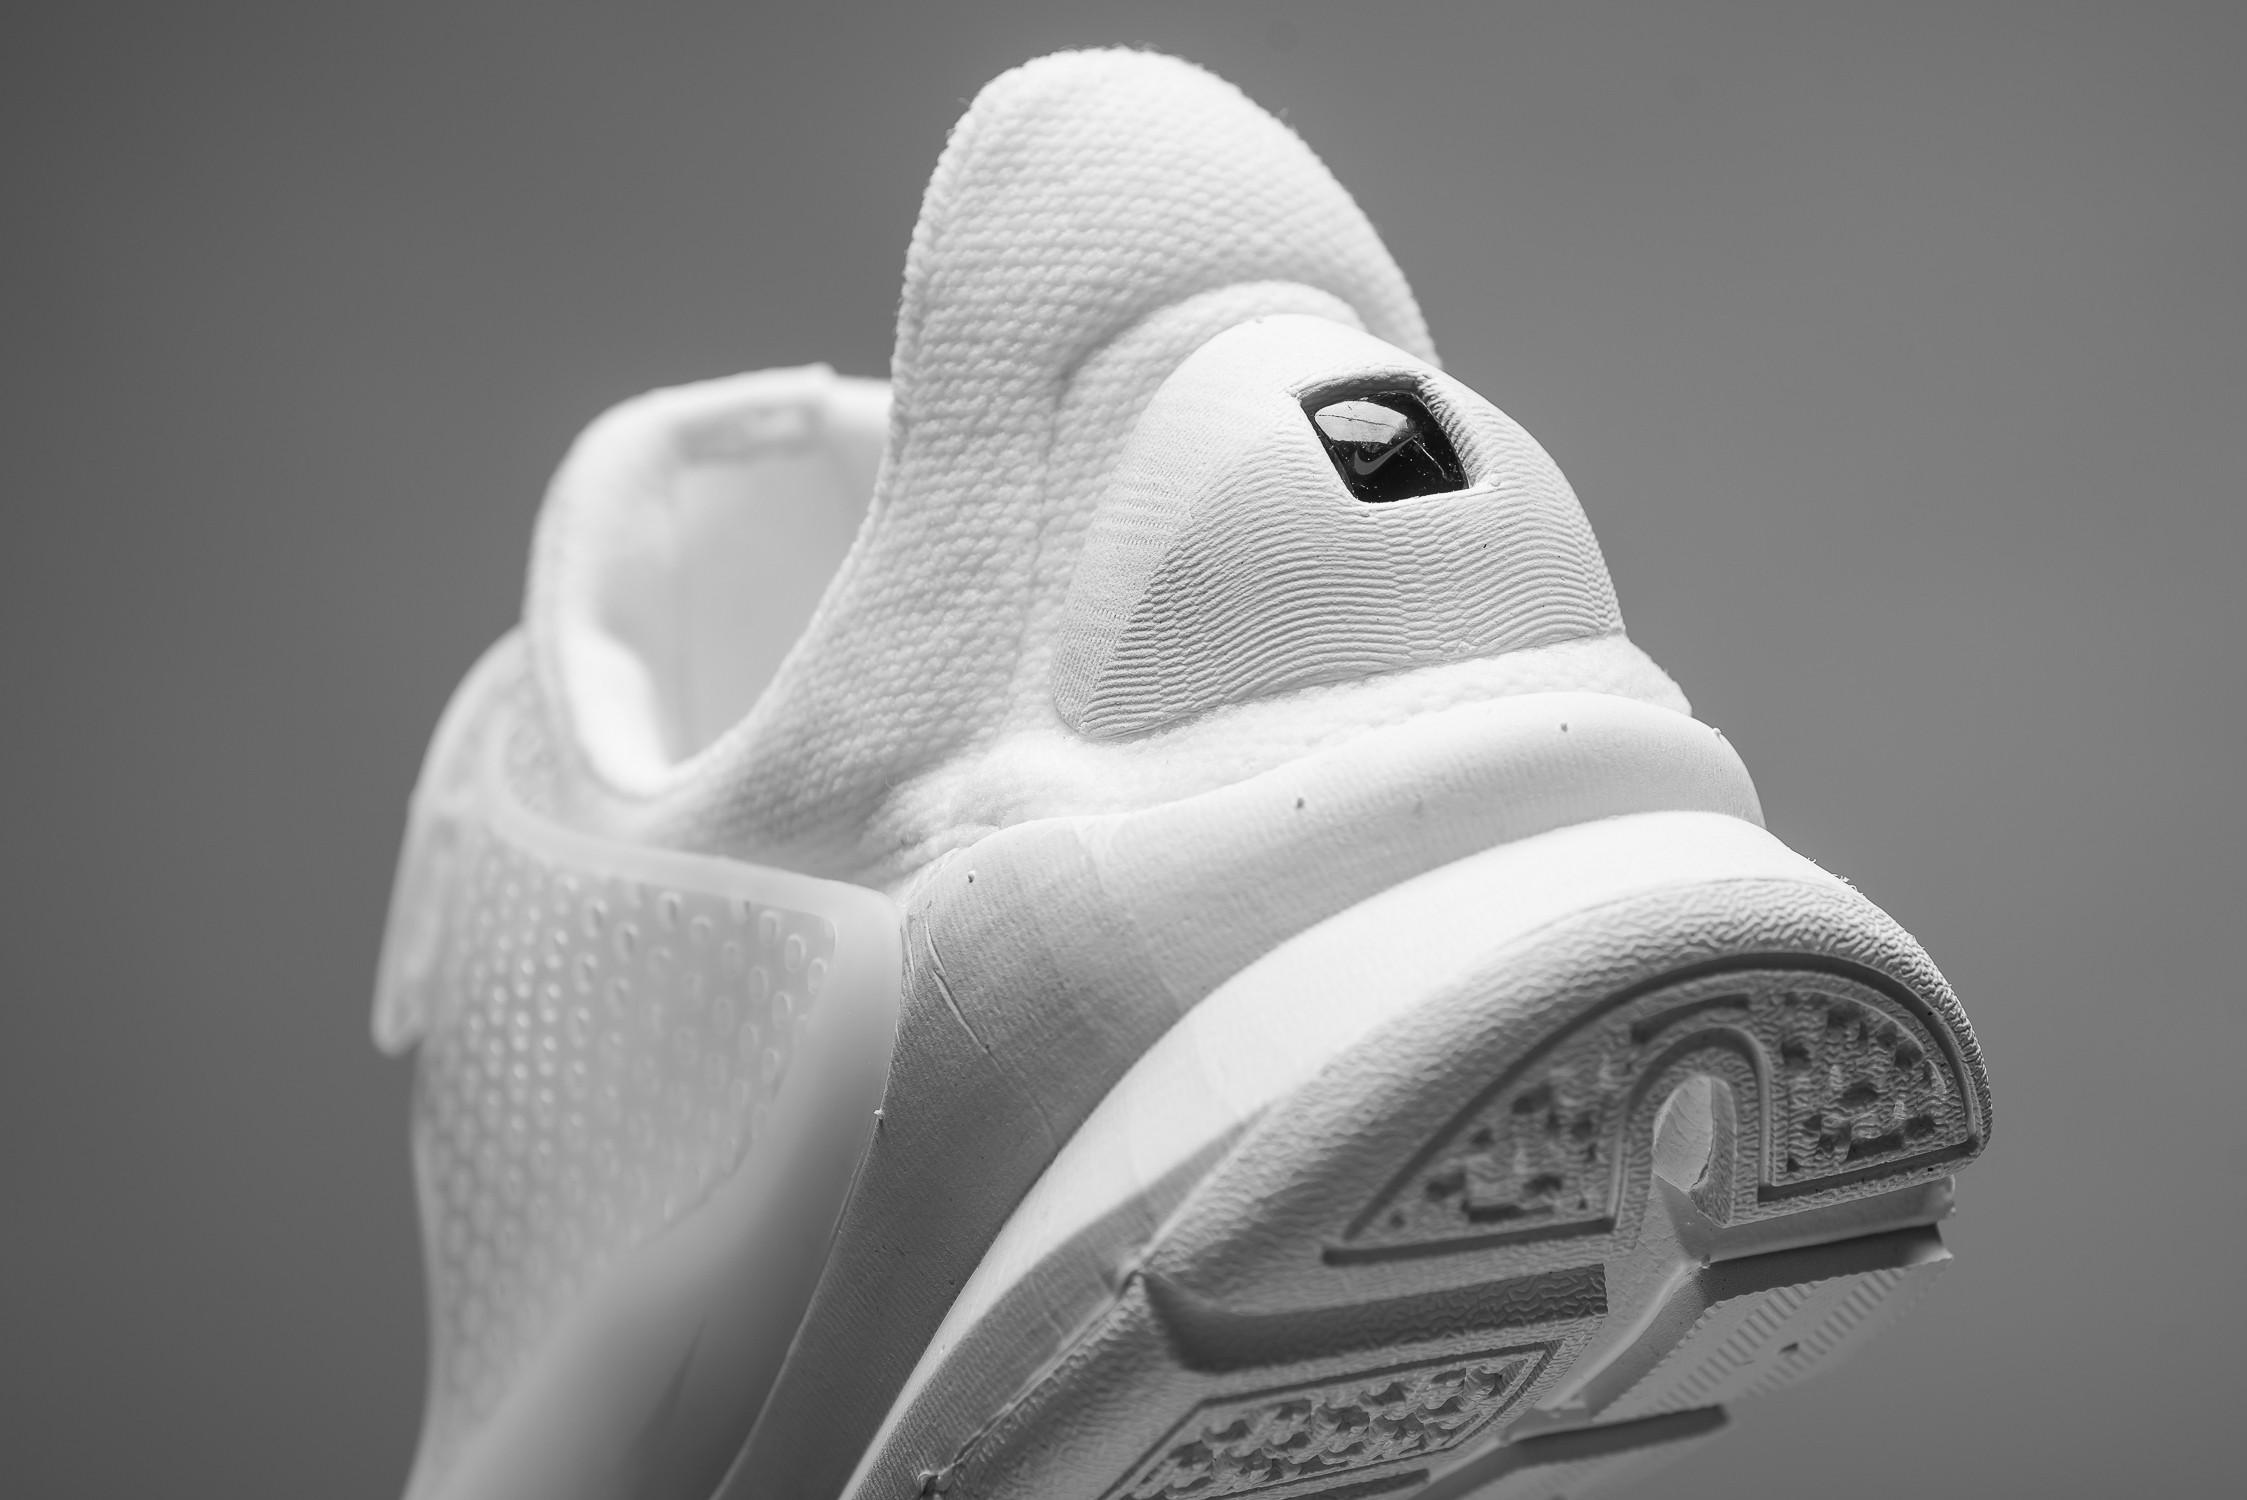 3a8ad0f66f5b0 The Nike Sock Dart Drops in Triple White-8 - WearTesters